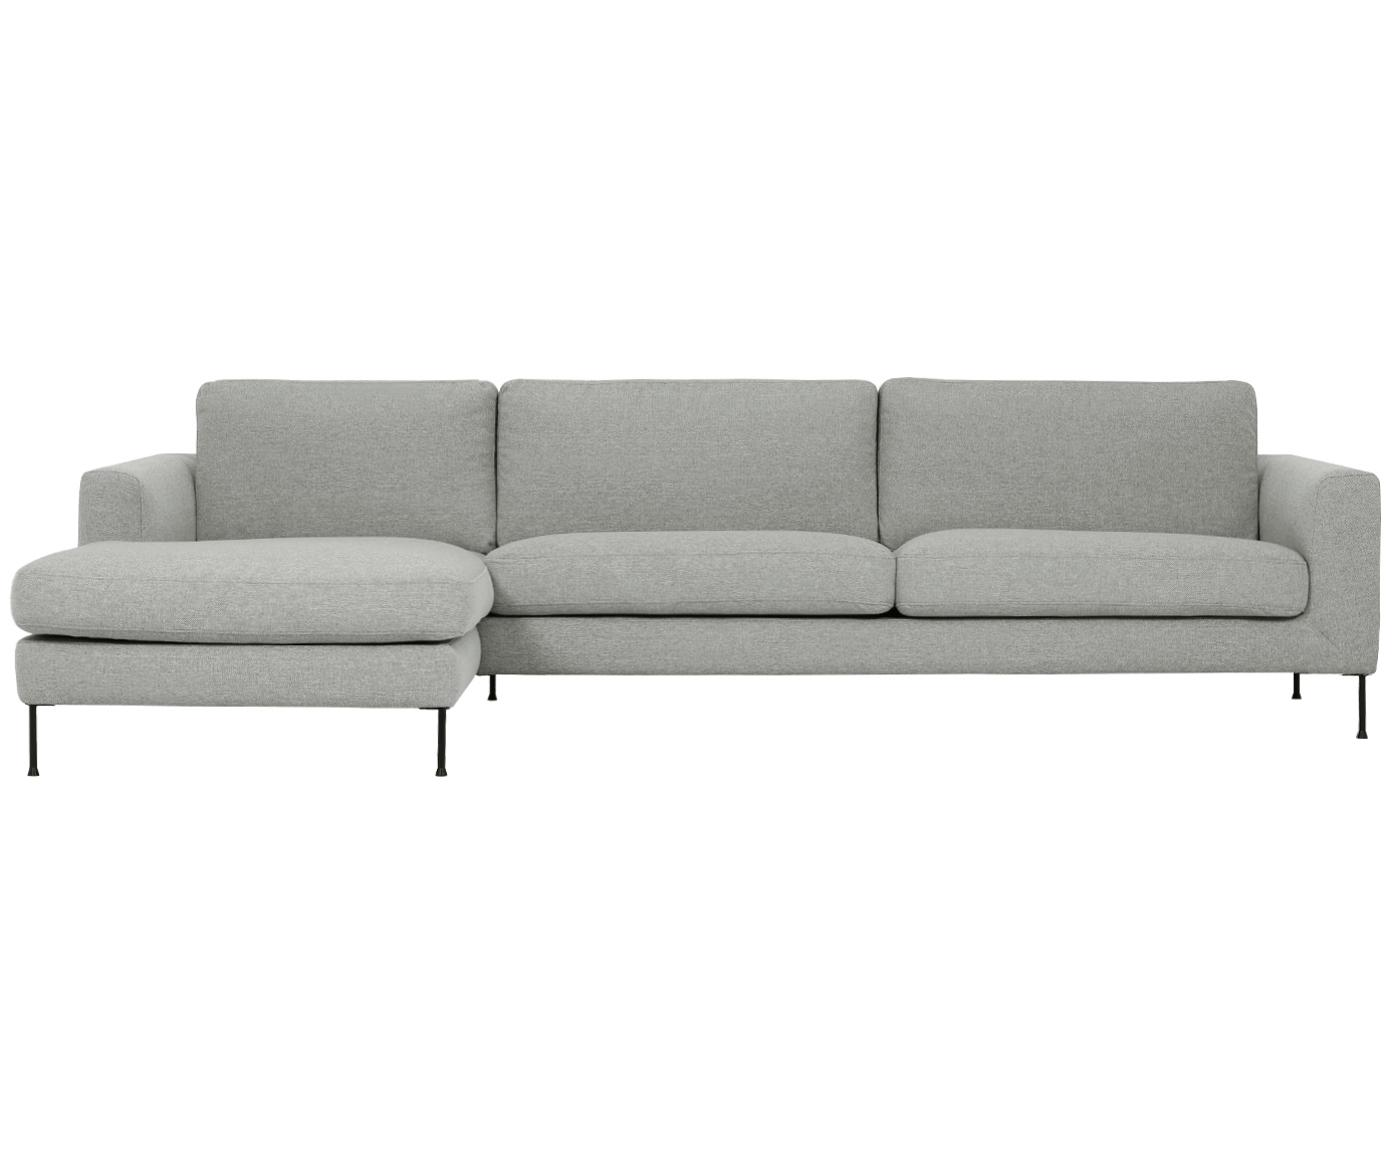 Ecksofa Cucita (4-Sitzer), Bezug: Webstoff (Polyester) 45.0, Gestell: Massives Kiefernholz, Webstoff Grau, B 302 x T 163 cm